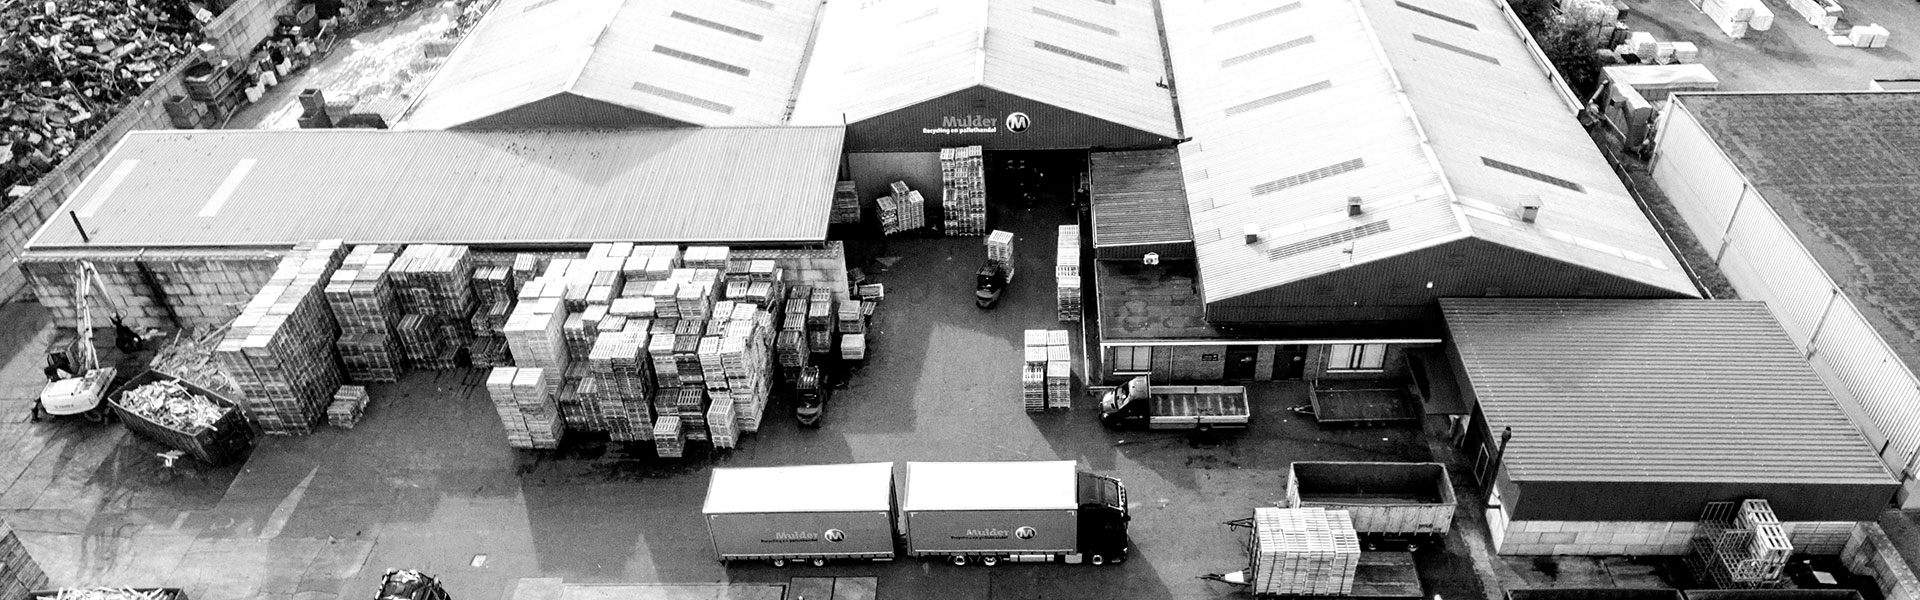 Mulder Recycling luchtfoto bedrijf